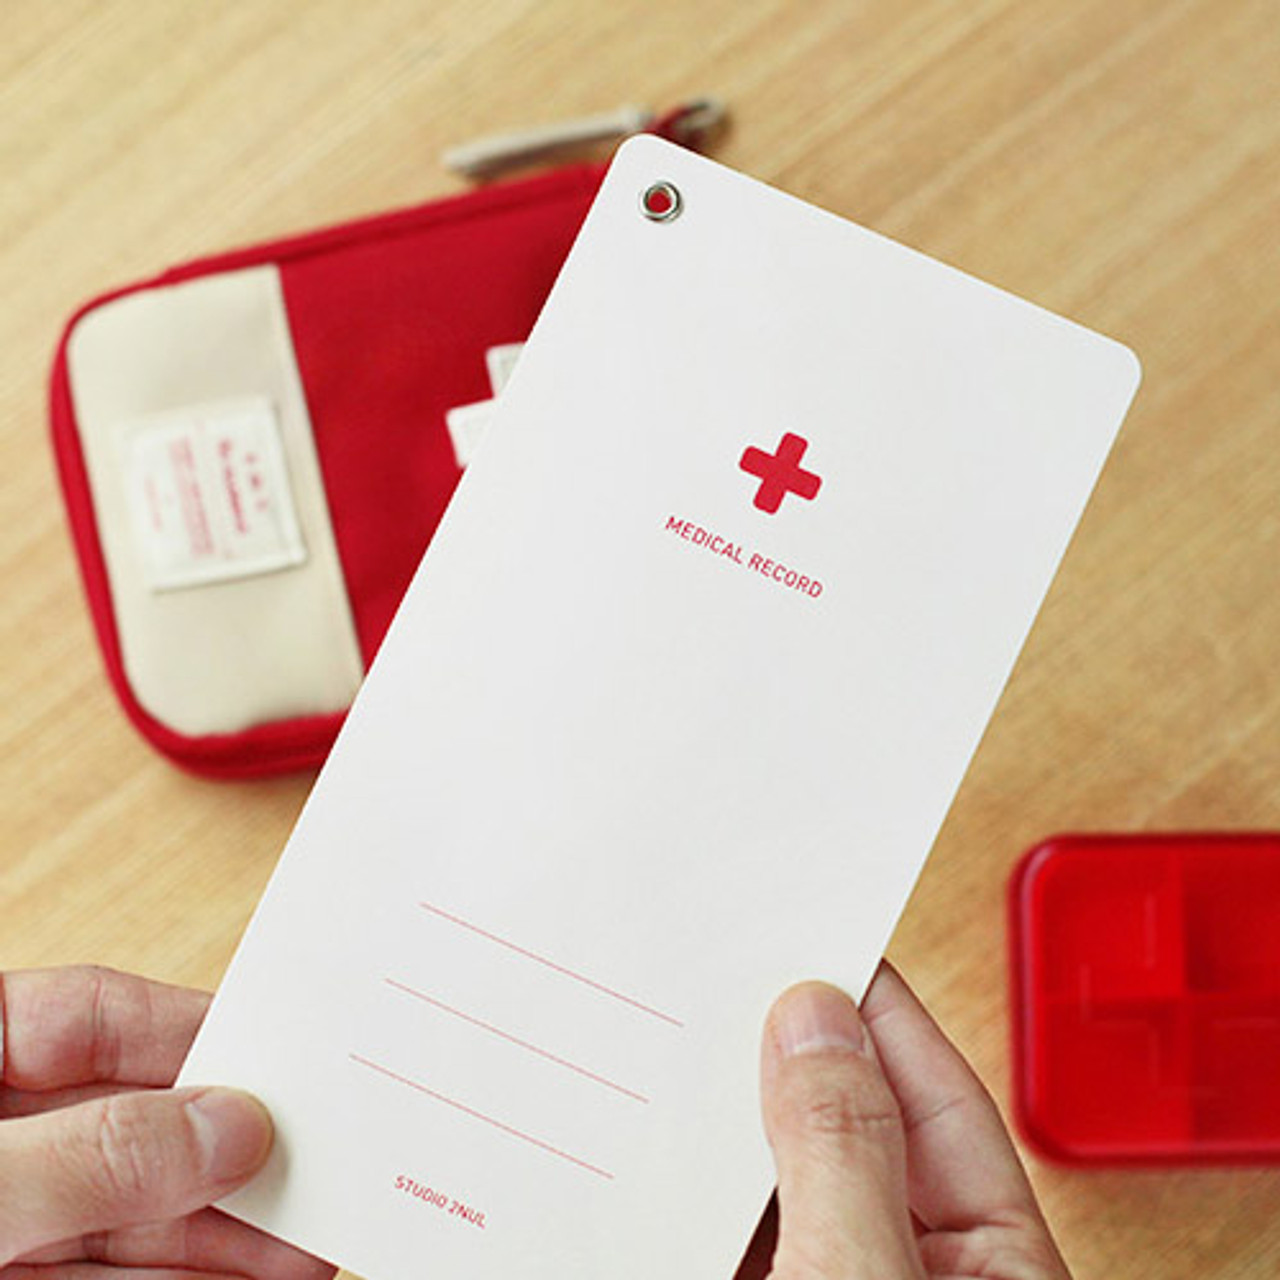 Free Walletsized Medical Information Card Pdf Template